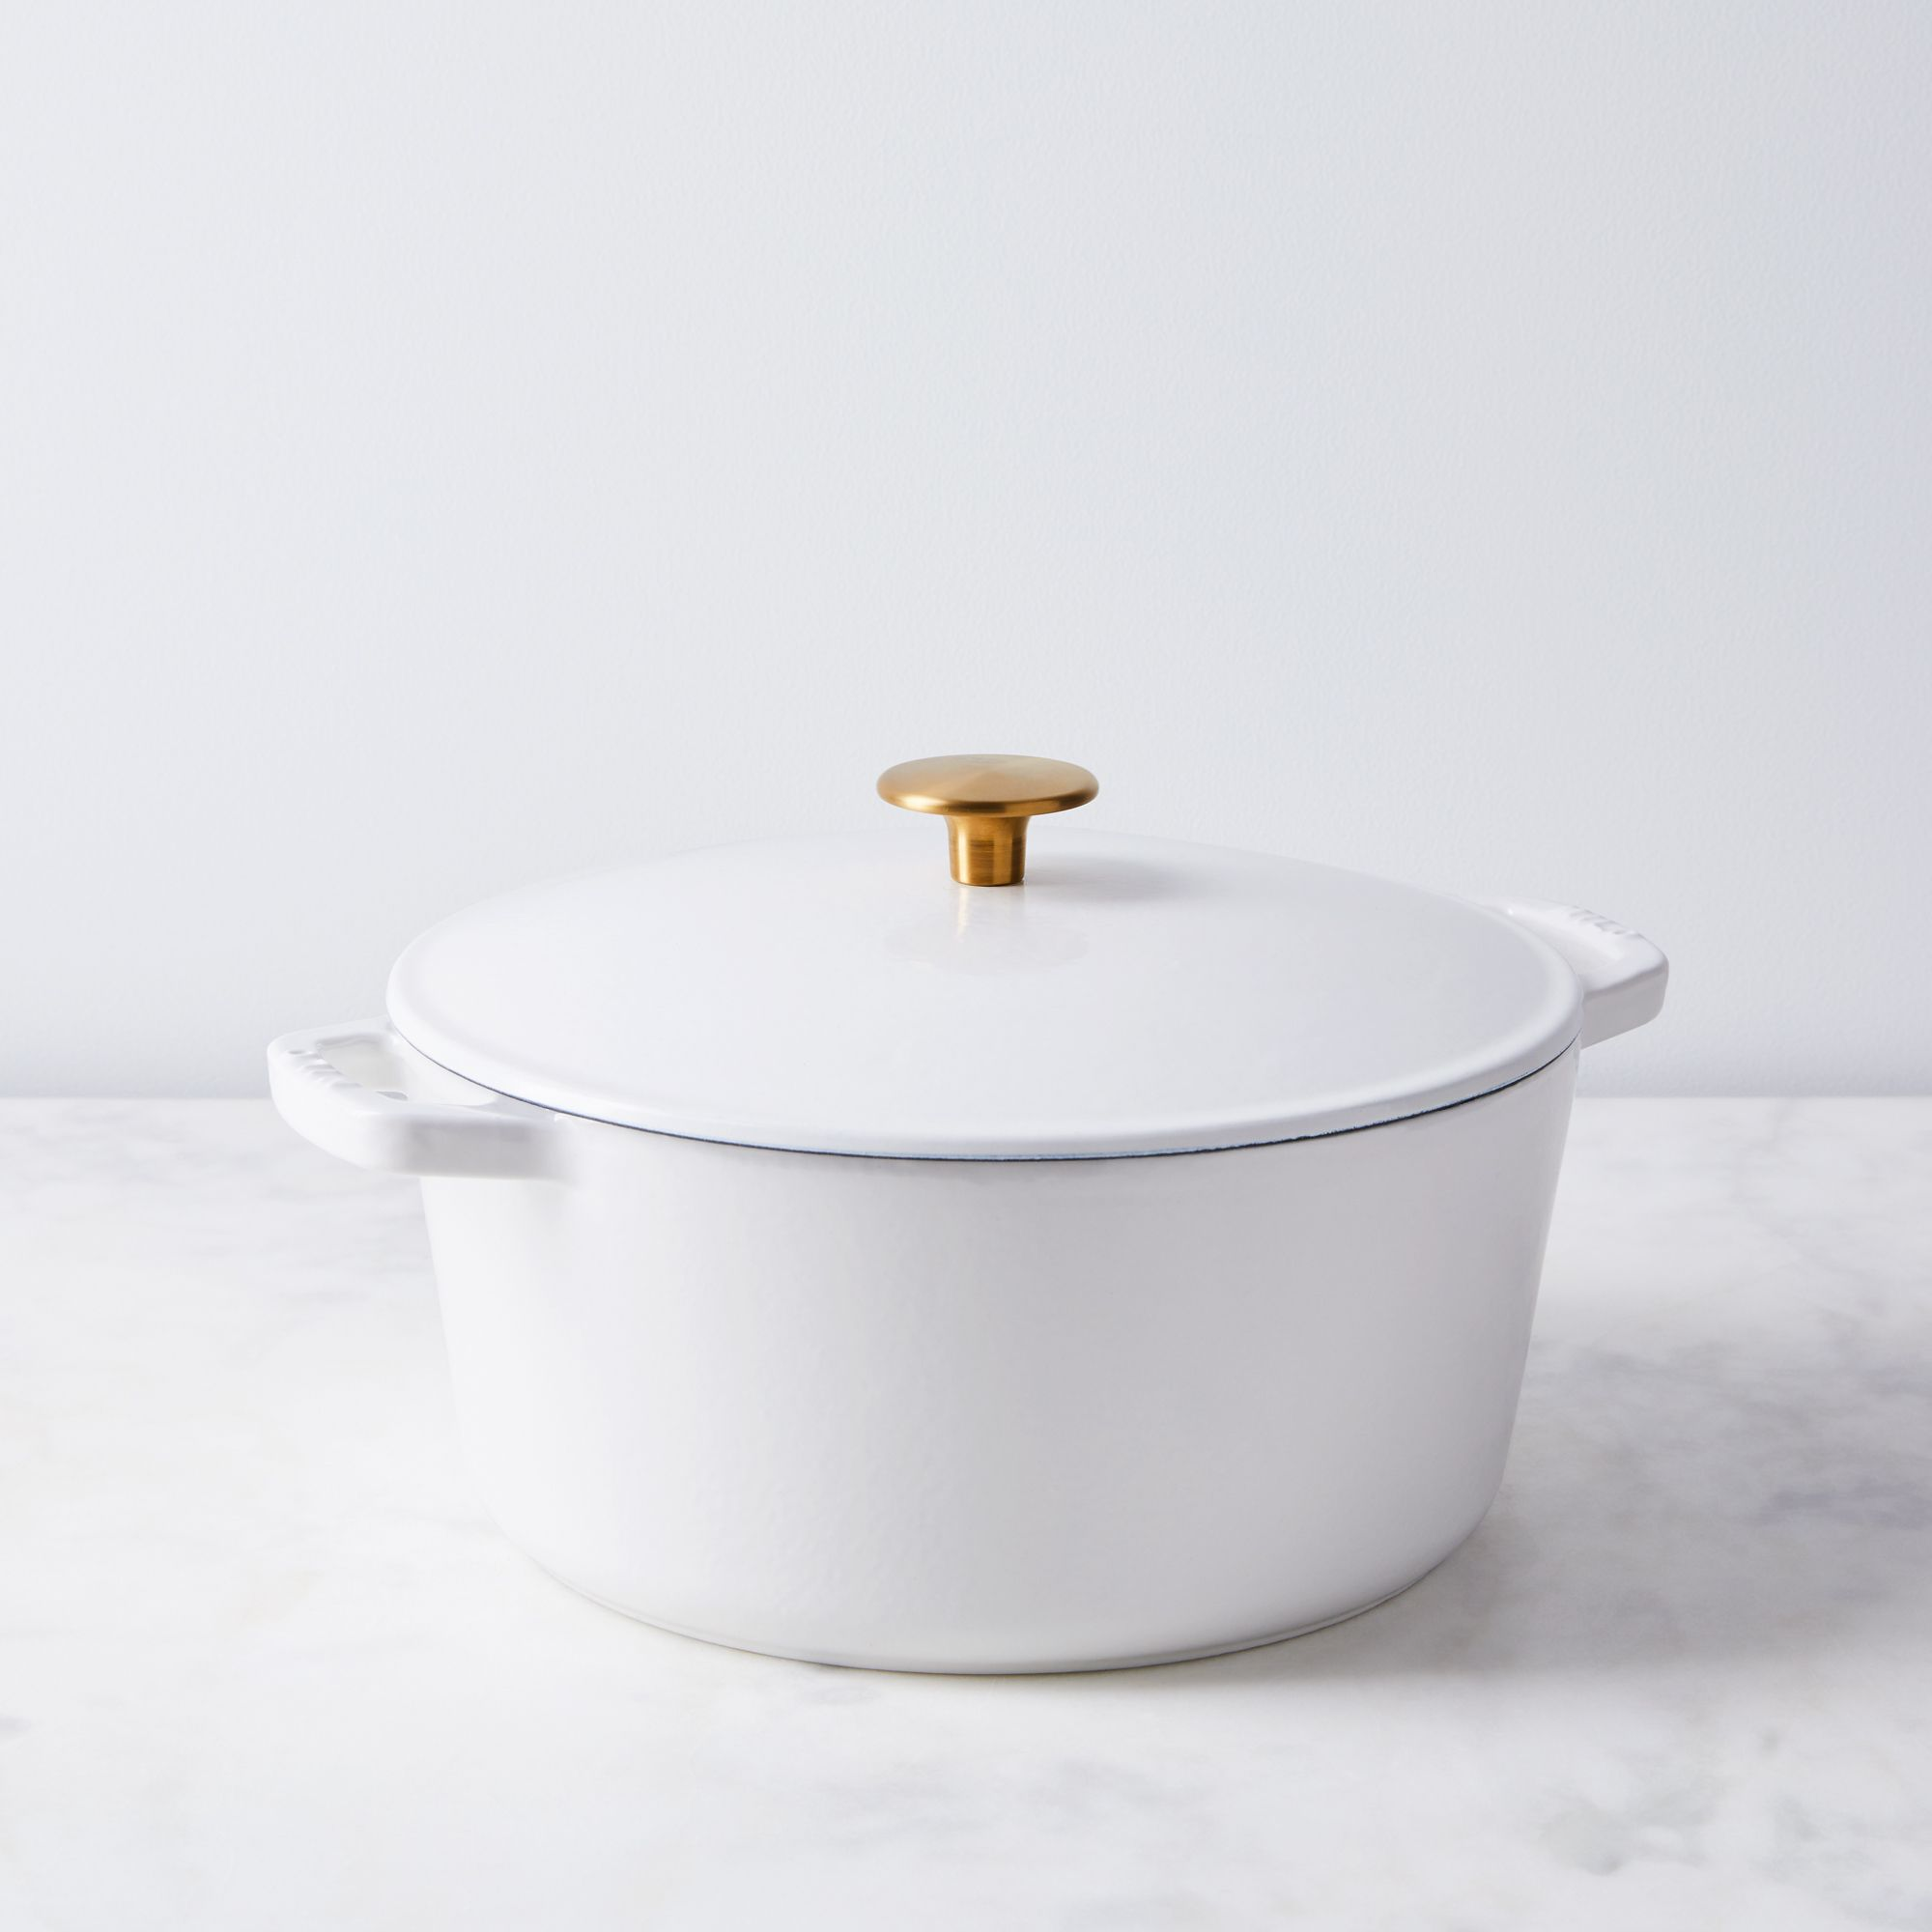 Milo Food52 x Milo Cast Iron Cookware - Food52 White & Brass , Dutch Oven, 5.5QT